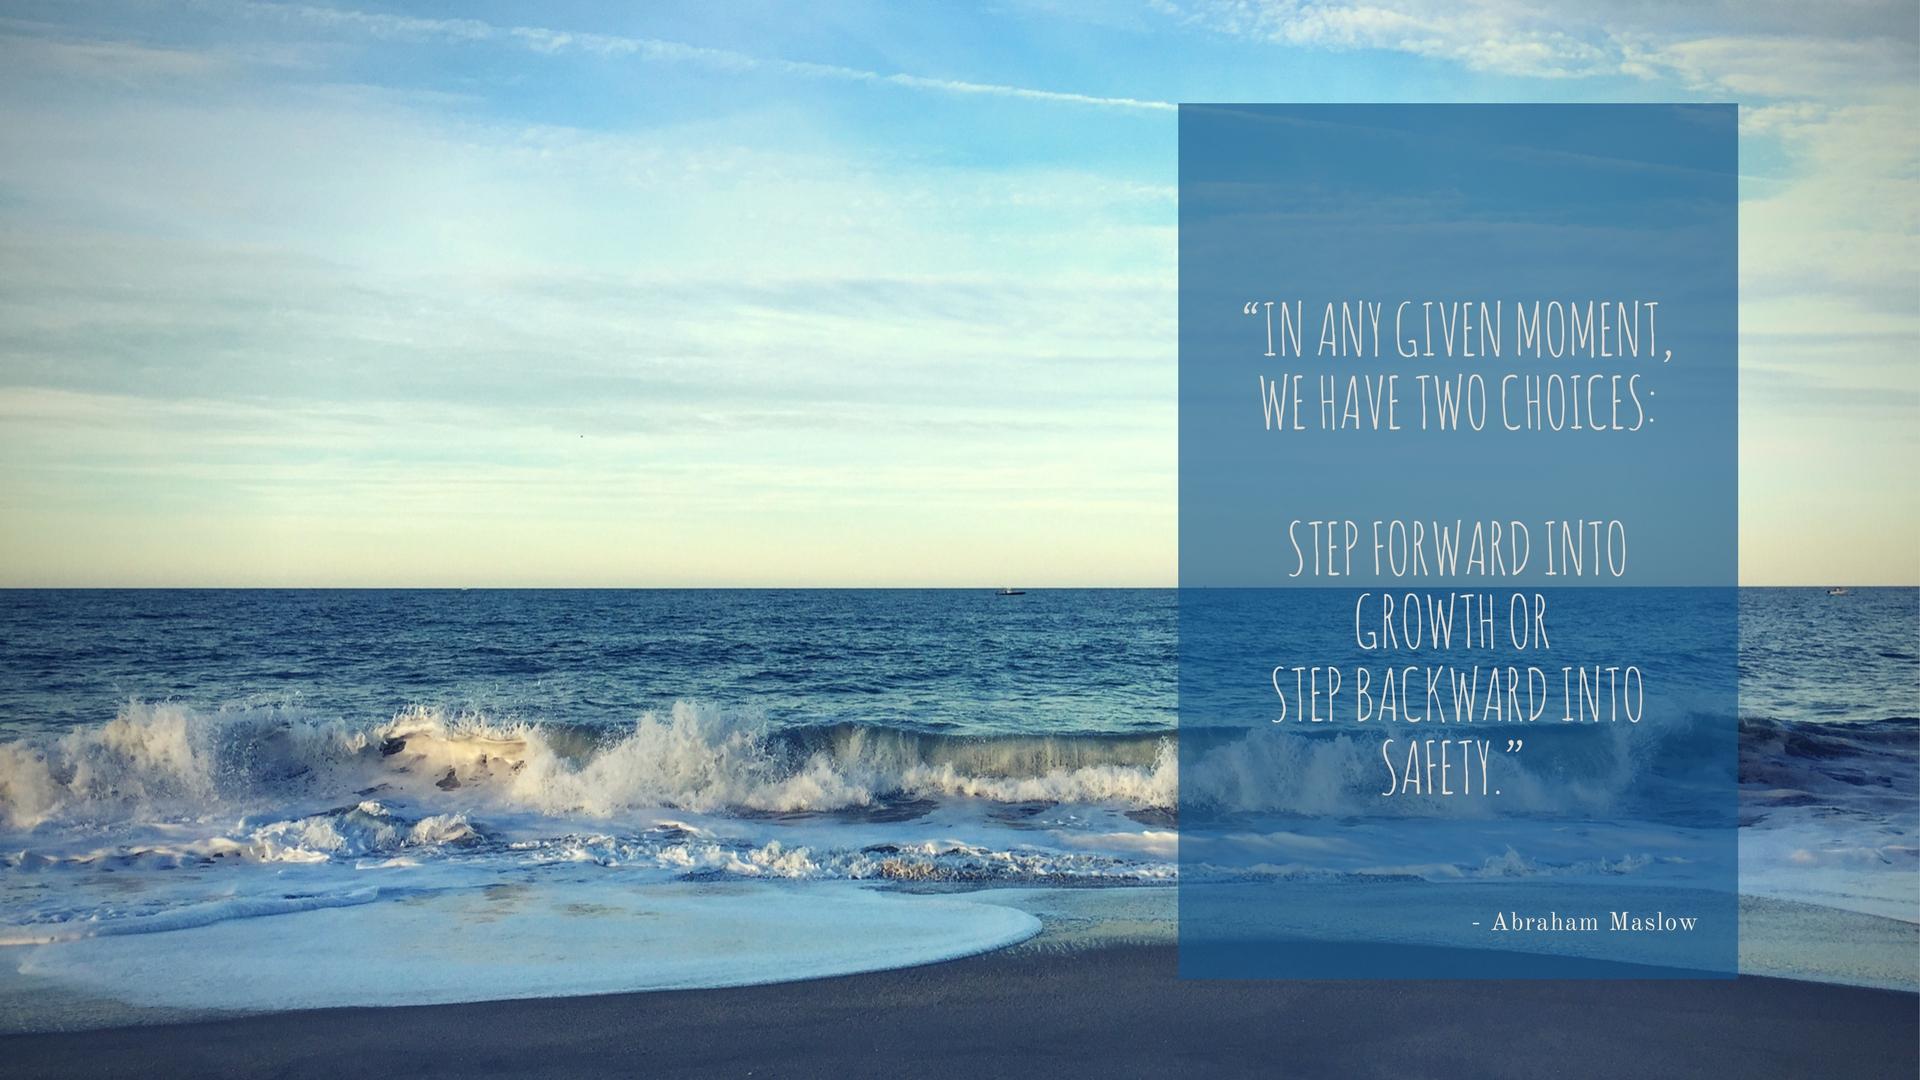 Step Forward into growth (1).jpg